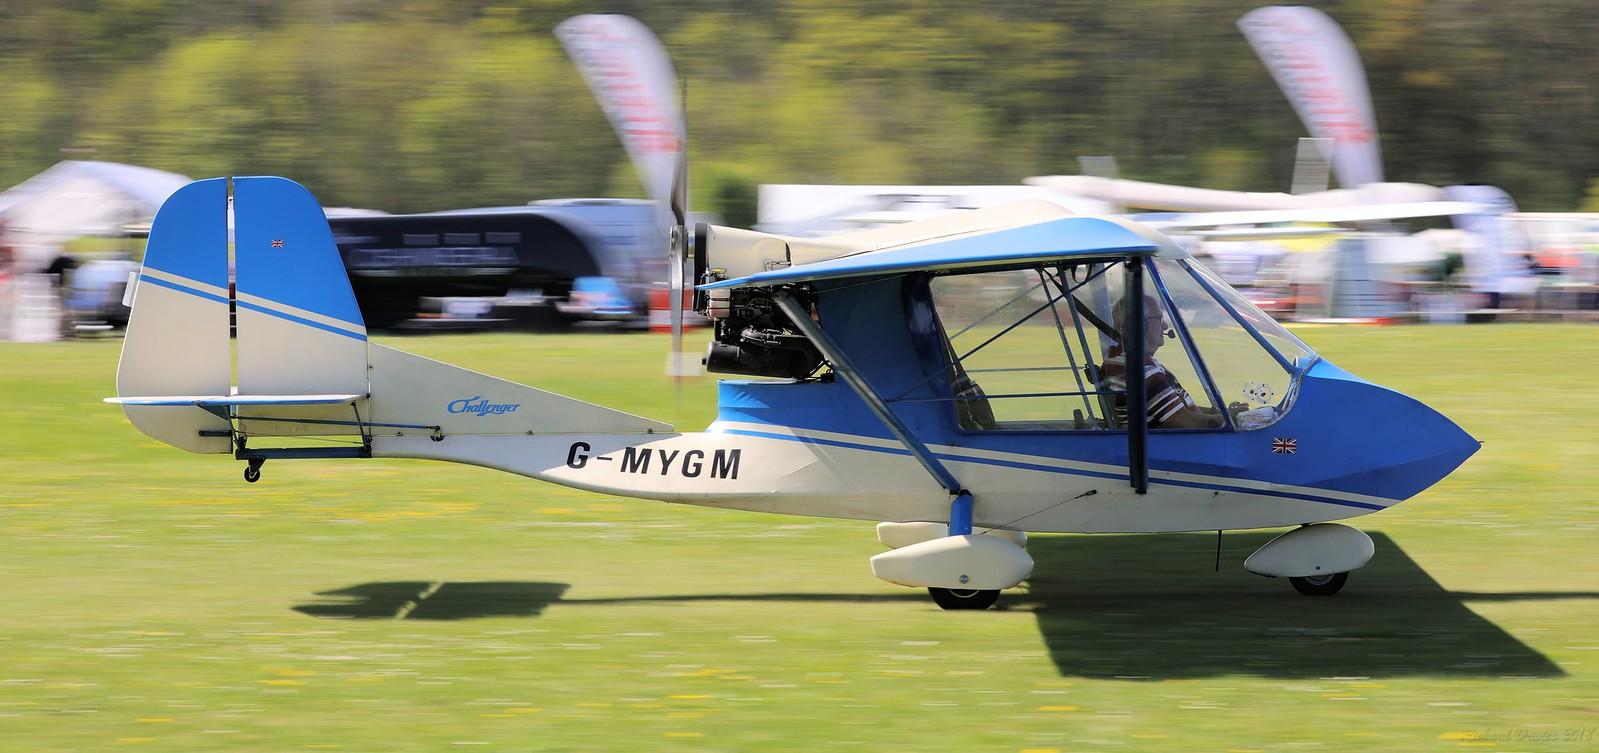 Popham Microlight Trade Fair 2018 - FLYER Forums